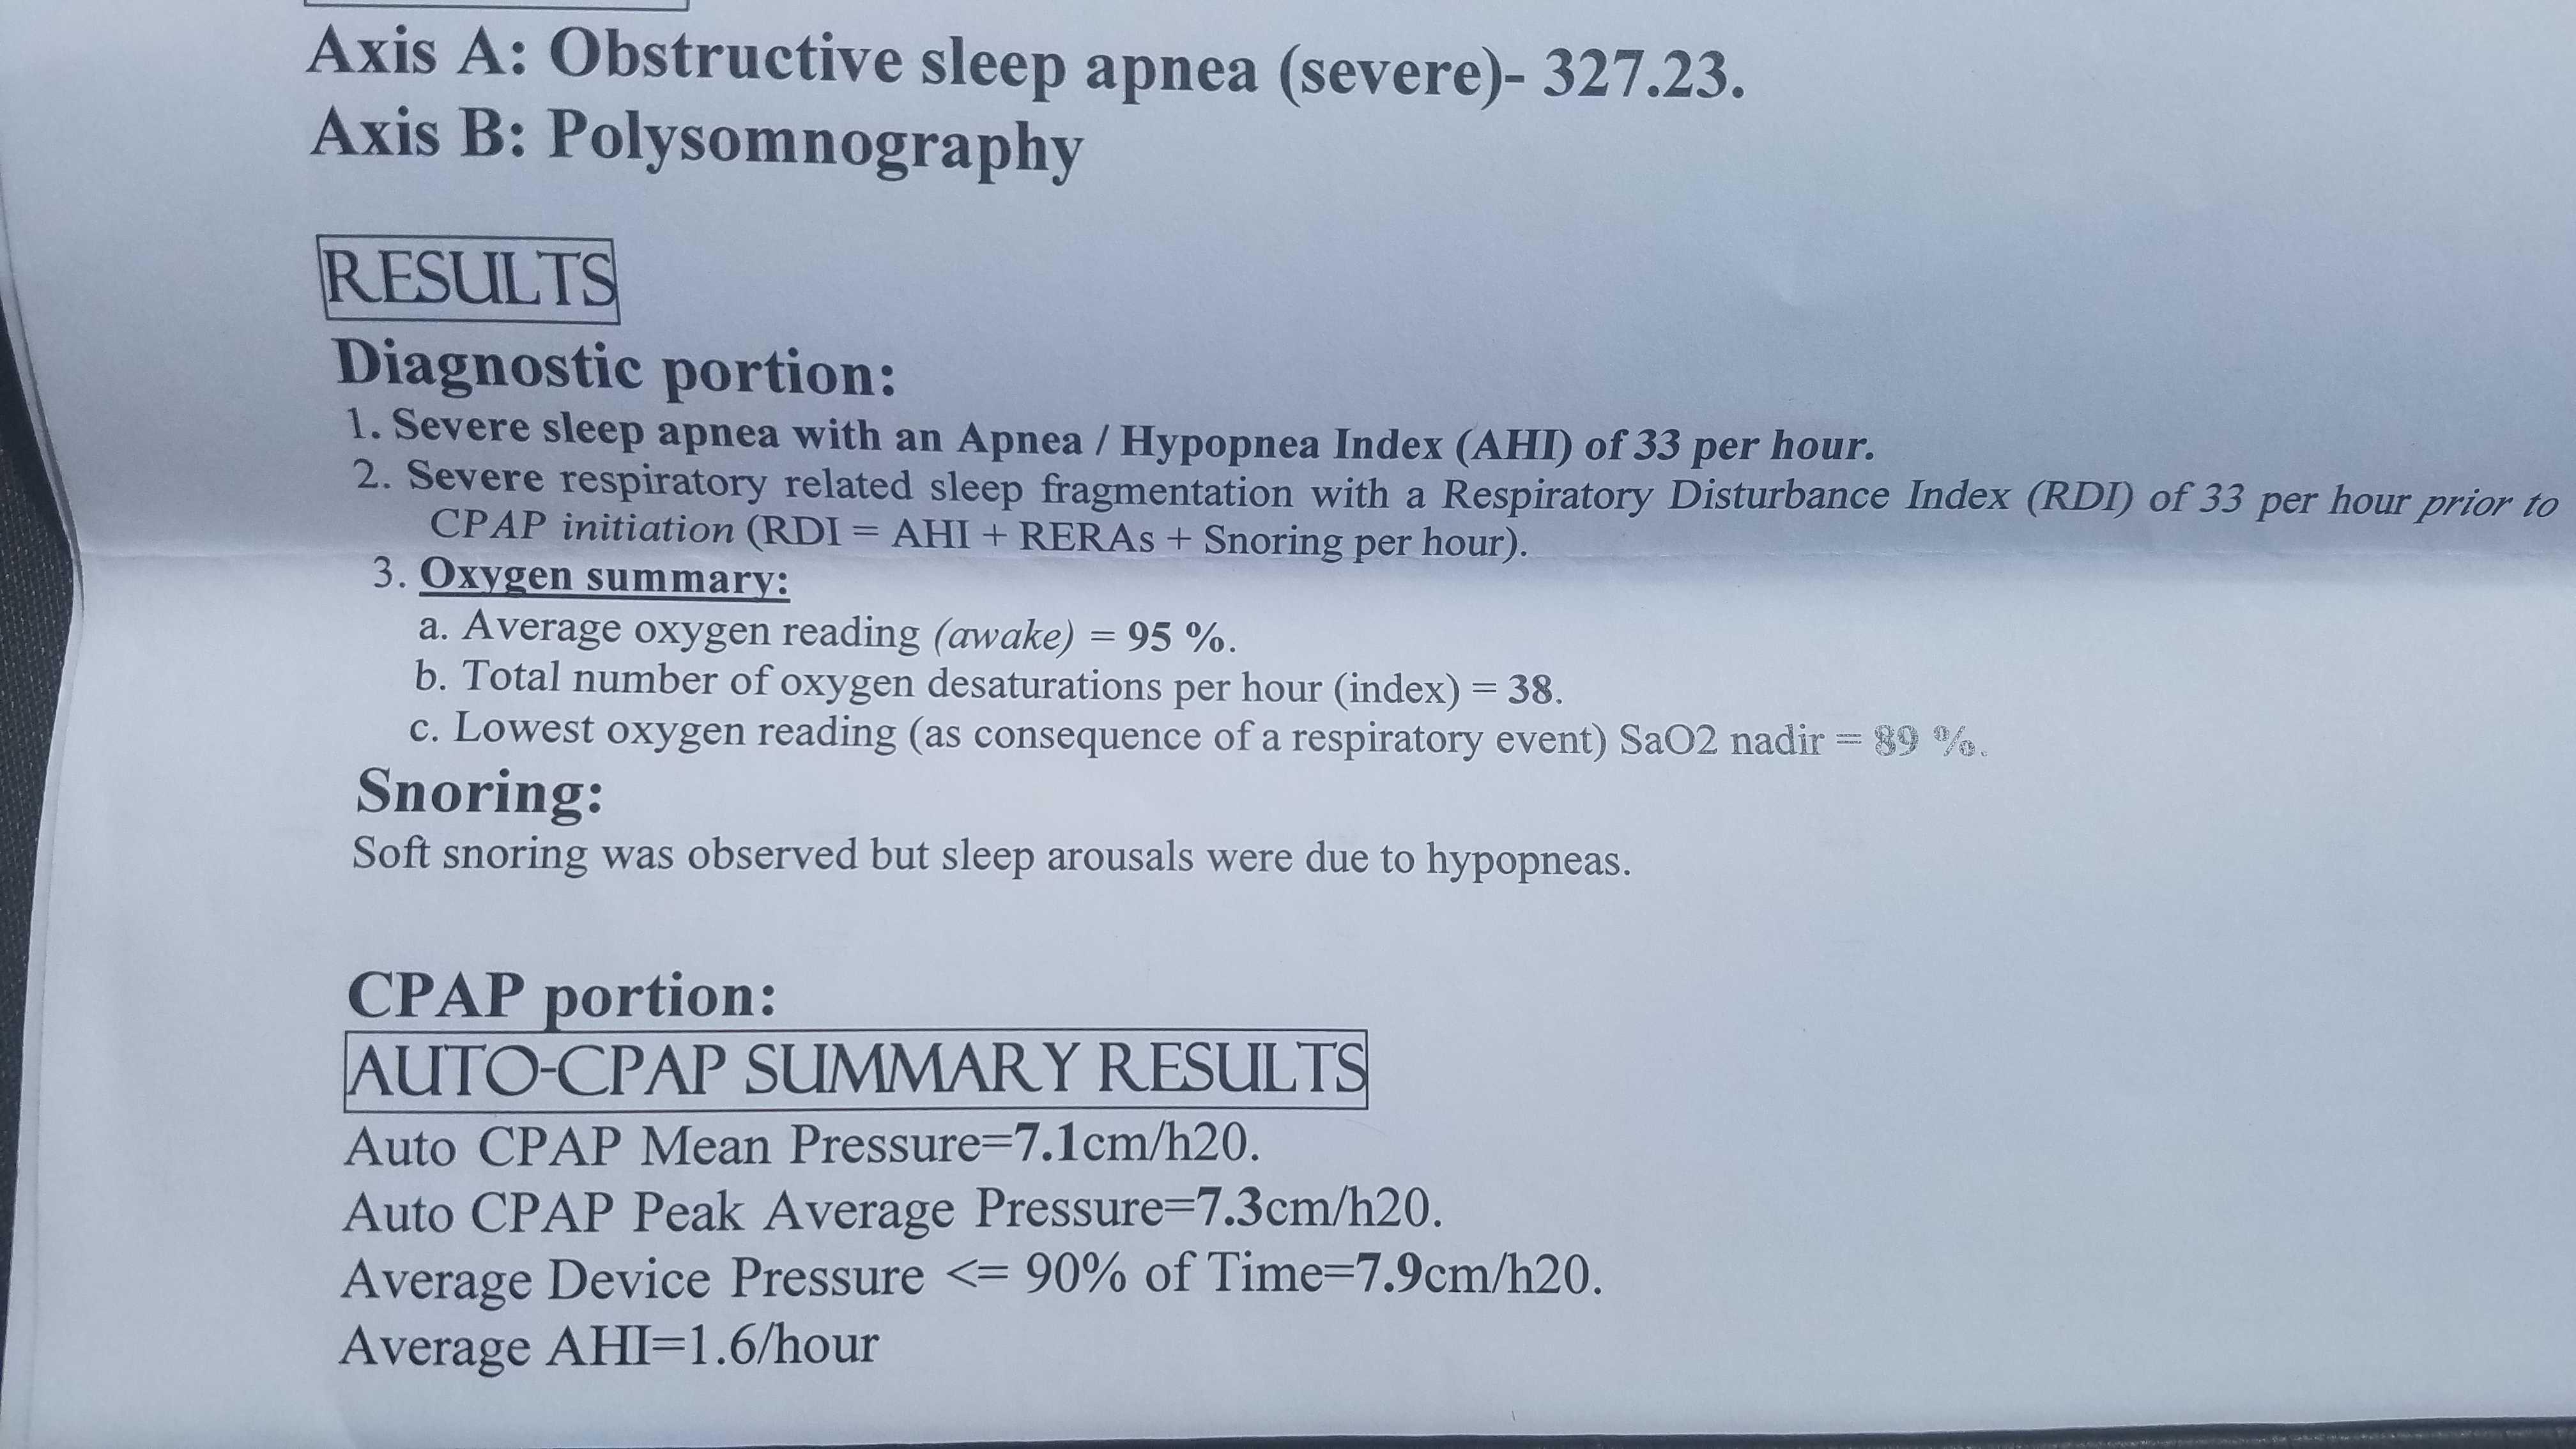 Can Sleep Apnea Be Reversed? Results From My Sleep Study